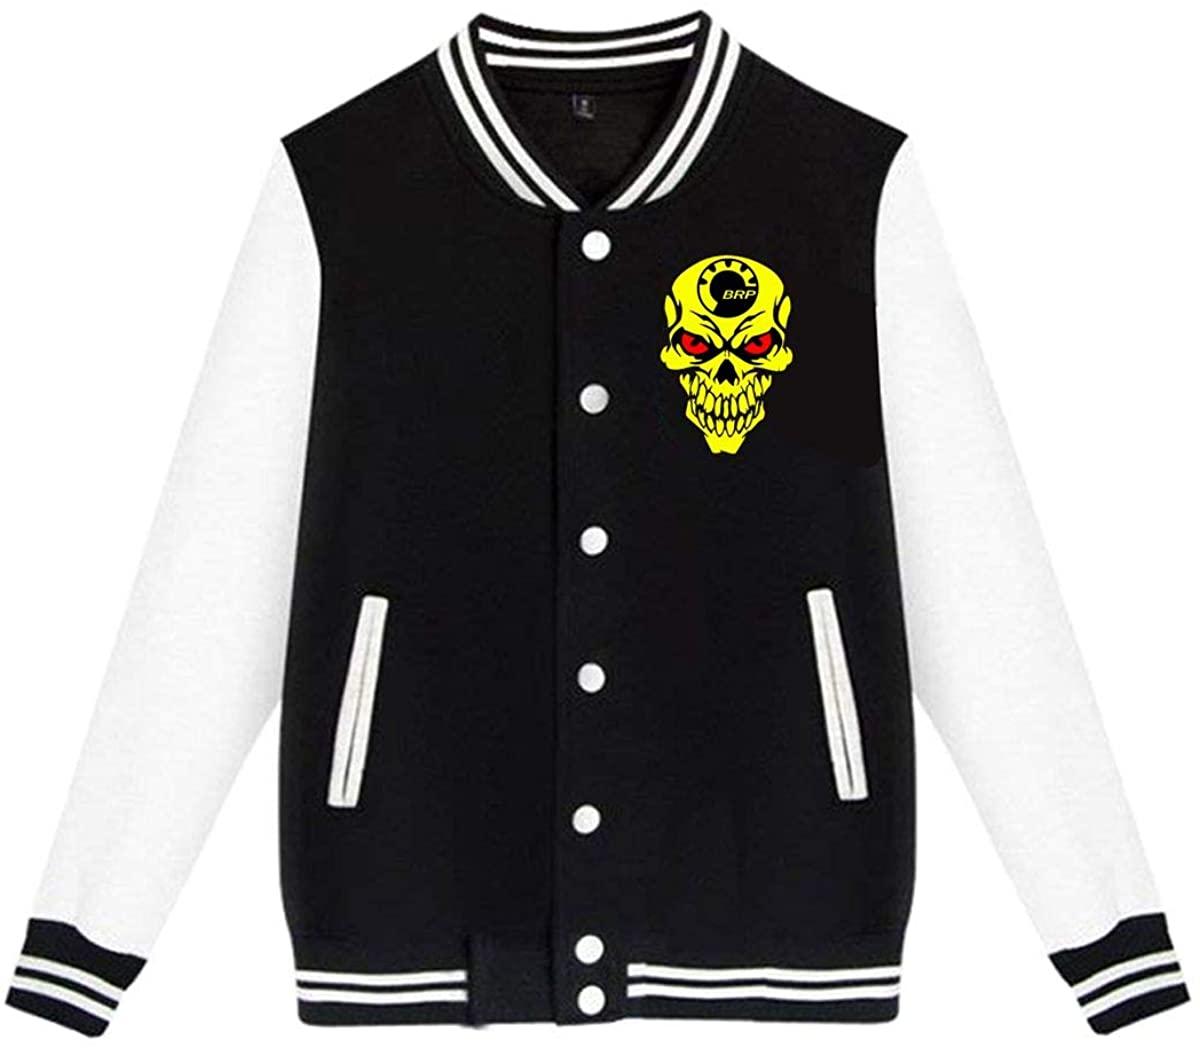 5husihai Can Am Team Brp Unisex Baseball Jacket Varsity Jacket